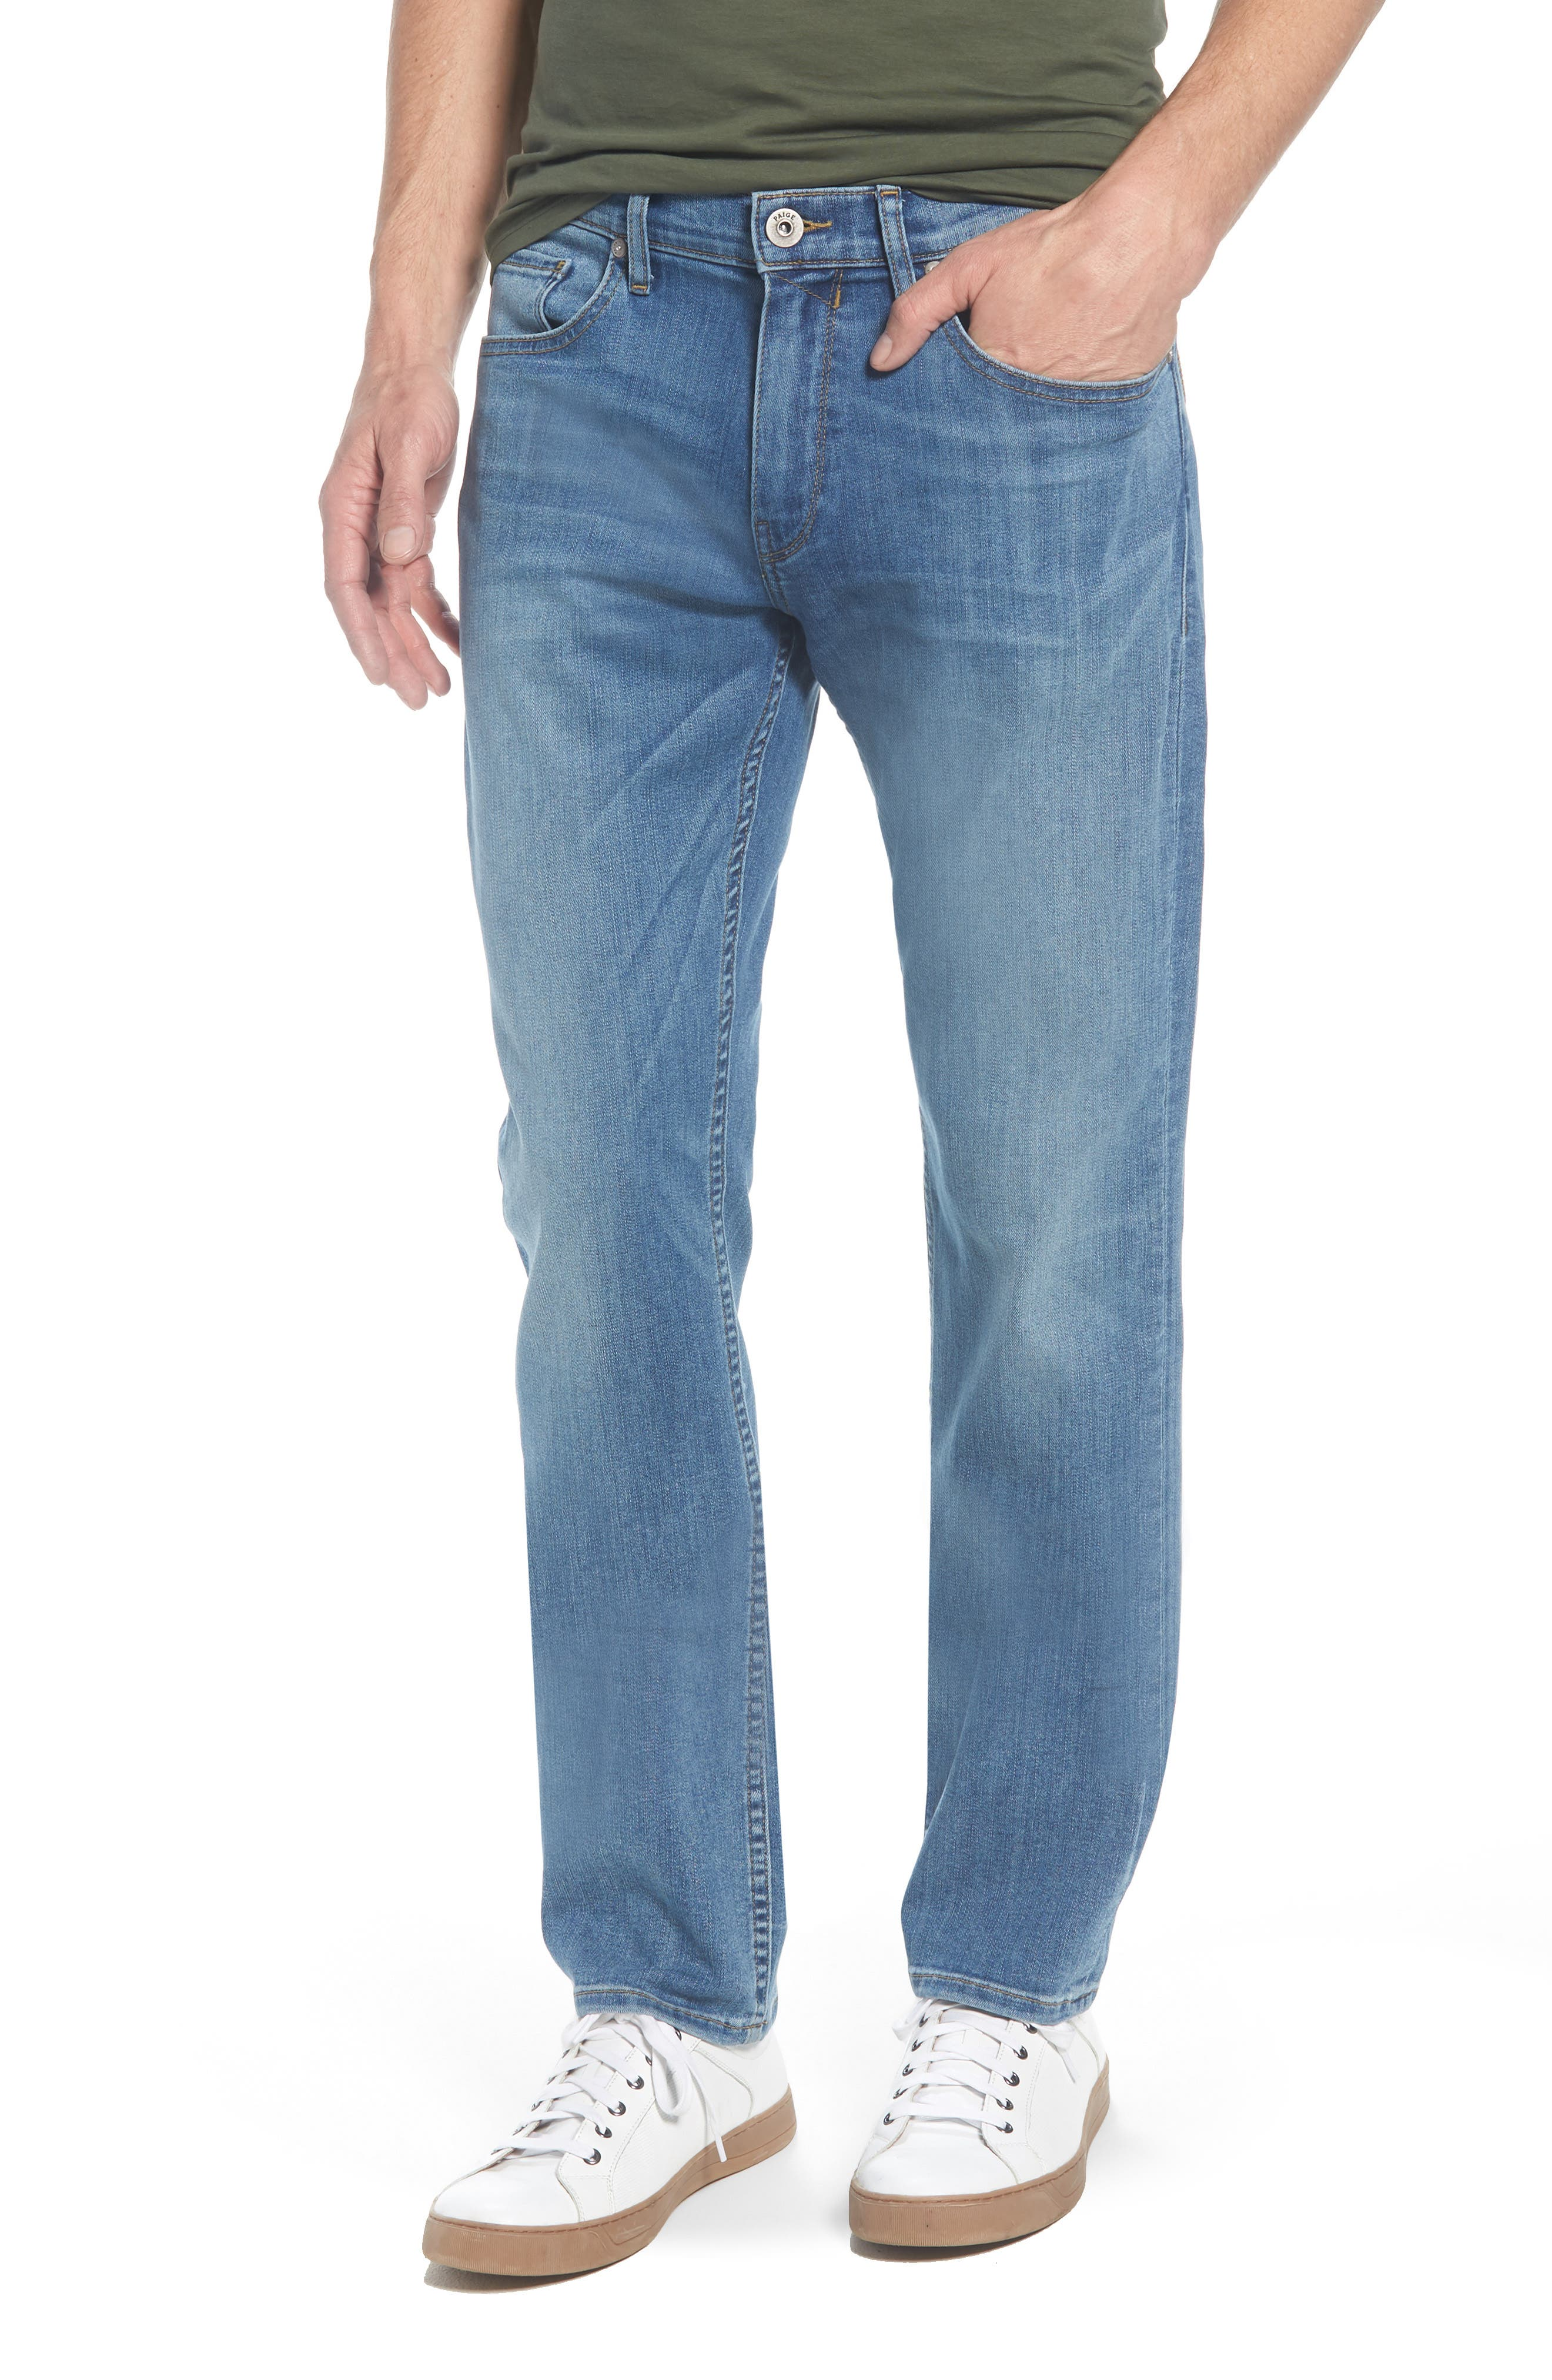 PAIGE,                             Federal Slim Straight Leg Jeans,                             Main thumbnail 1, color,                             400